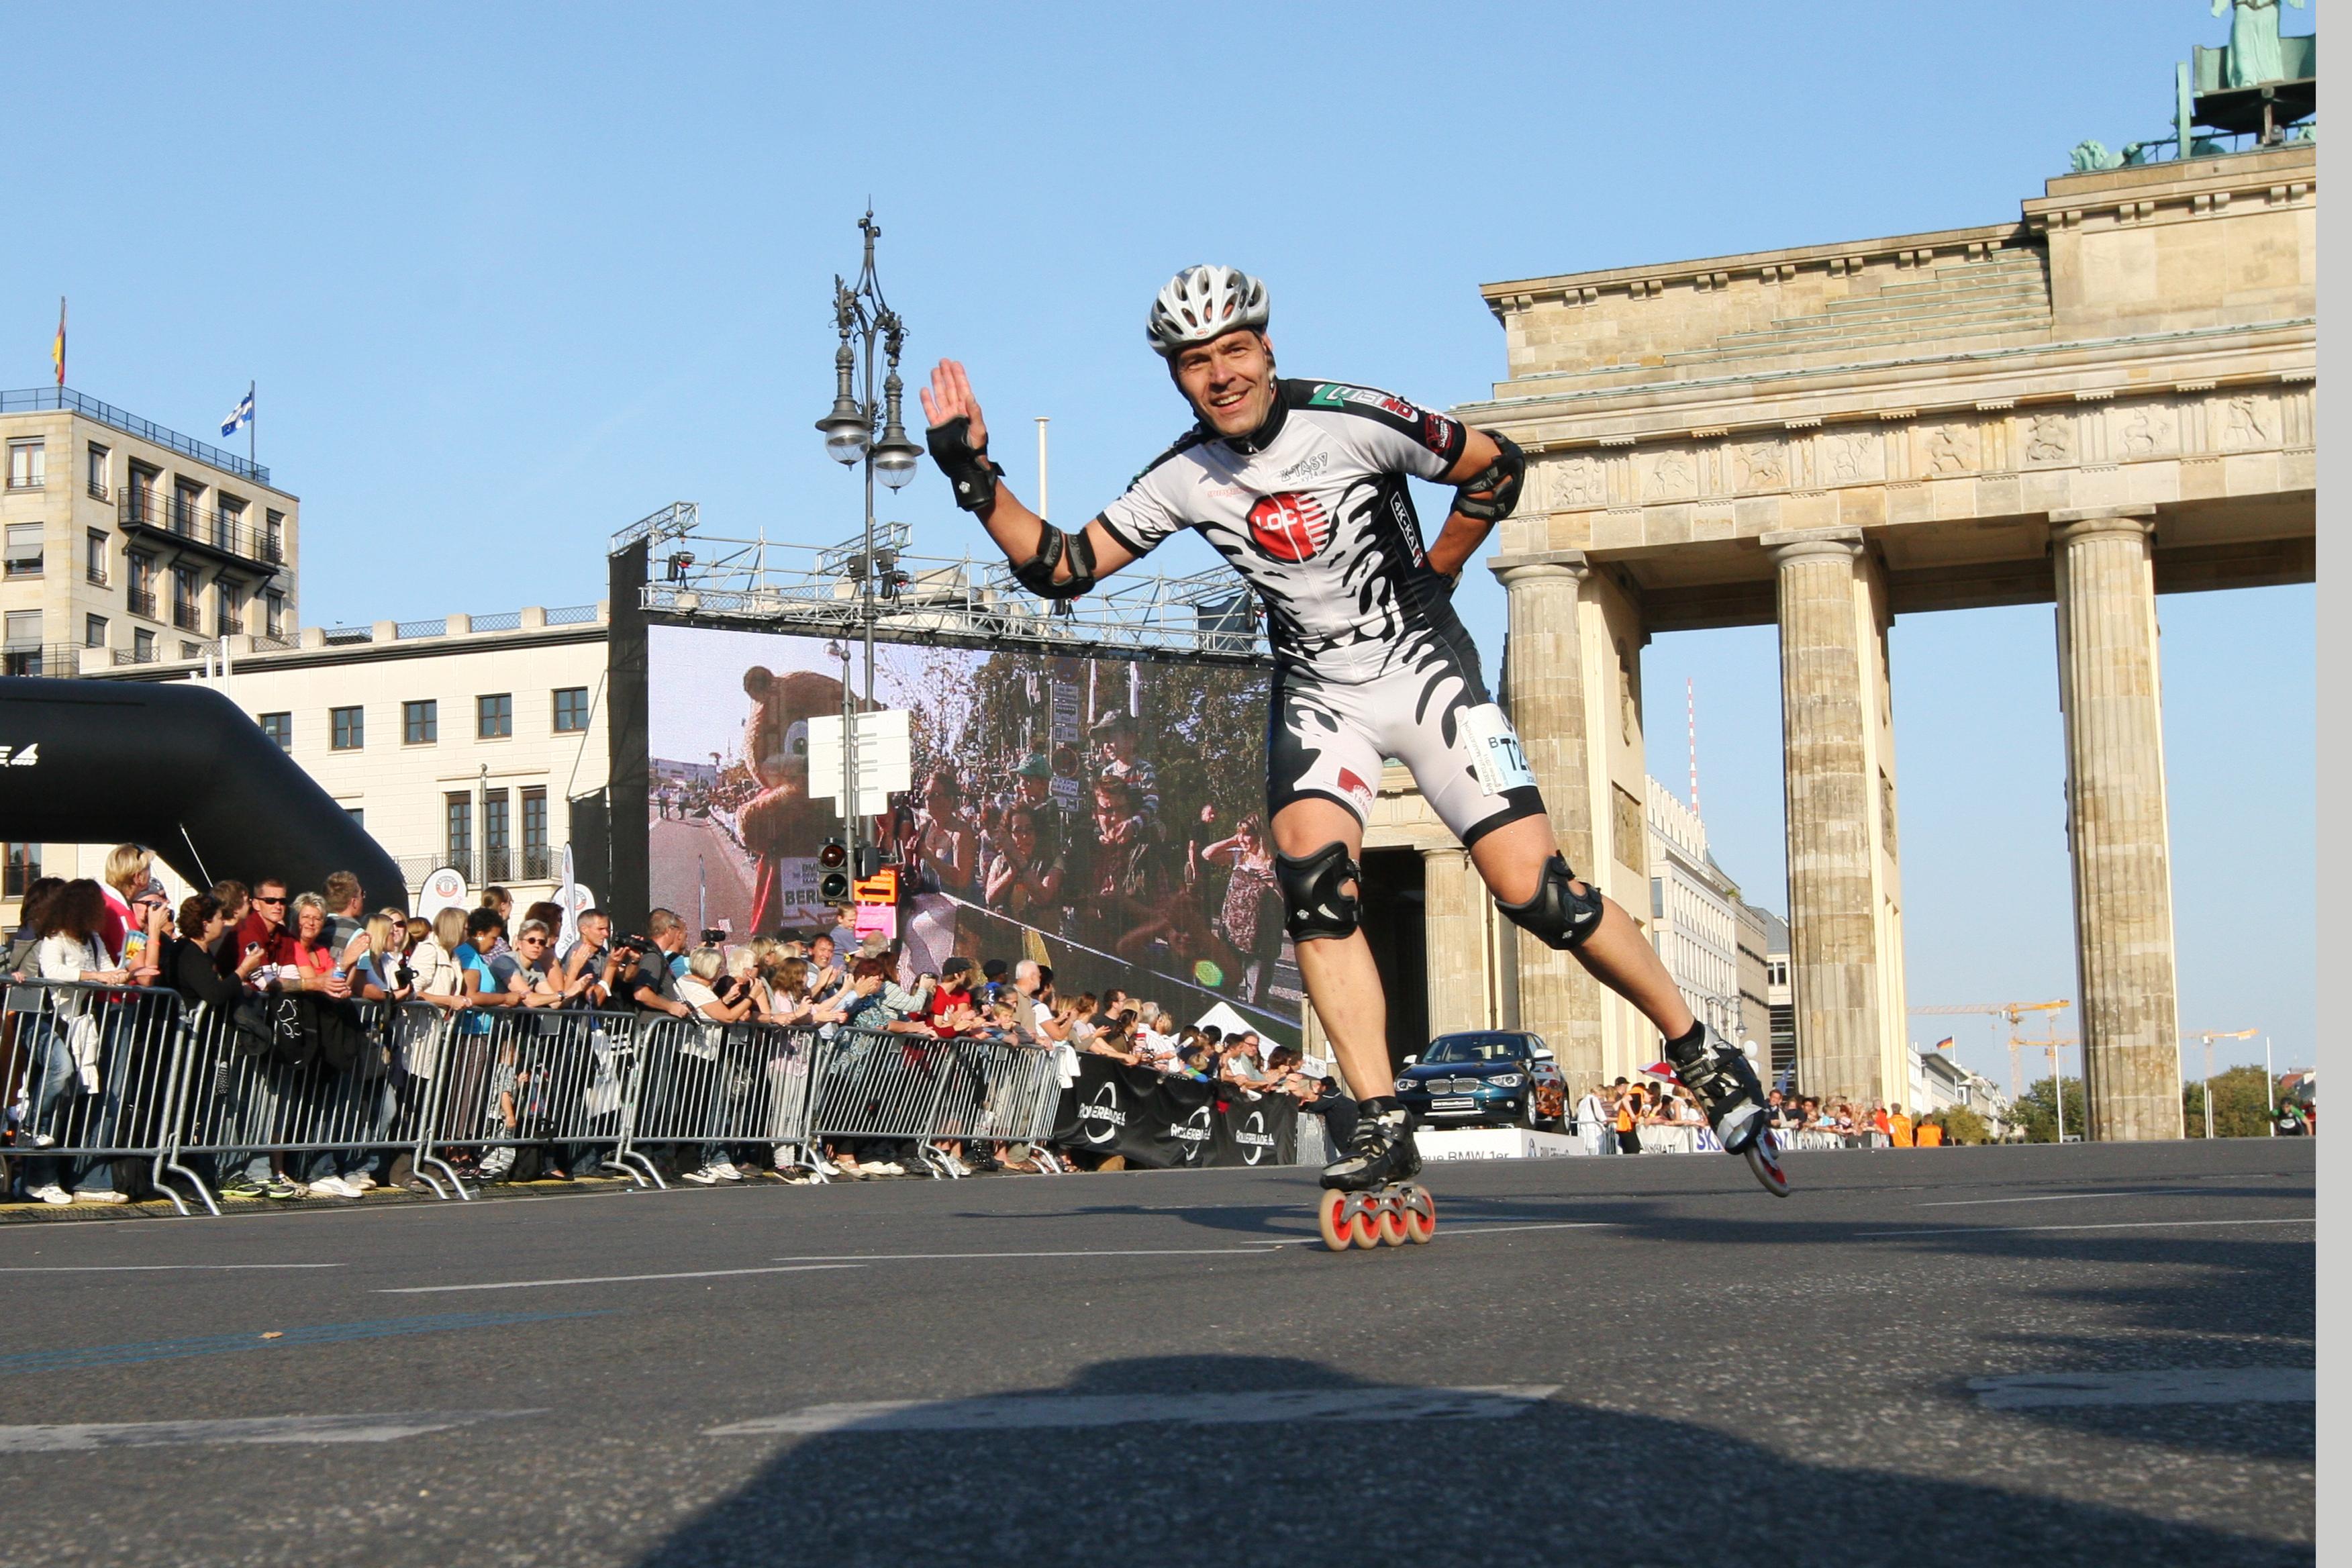 Skate Marathon Berlin 2020